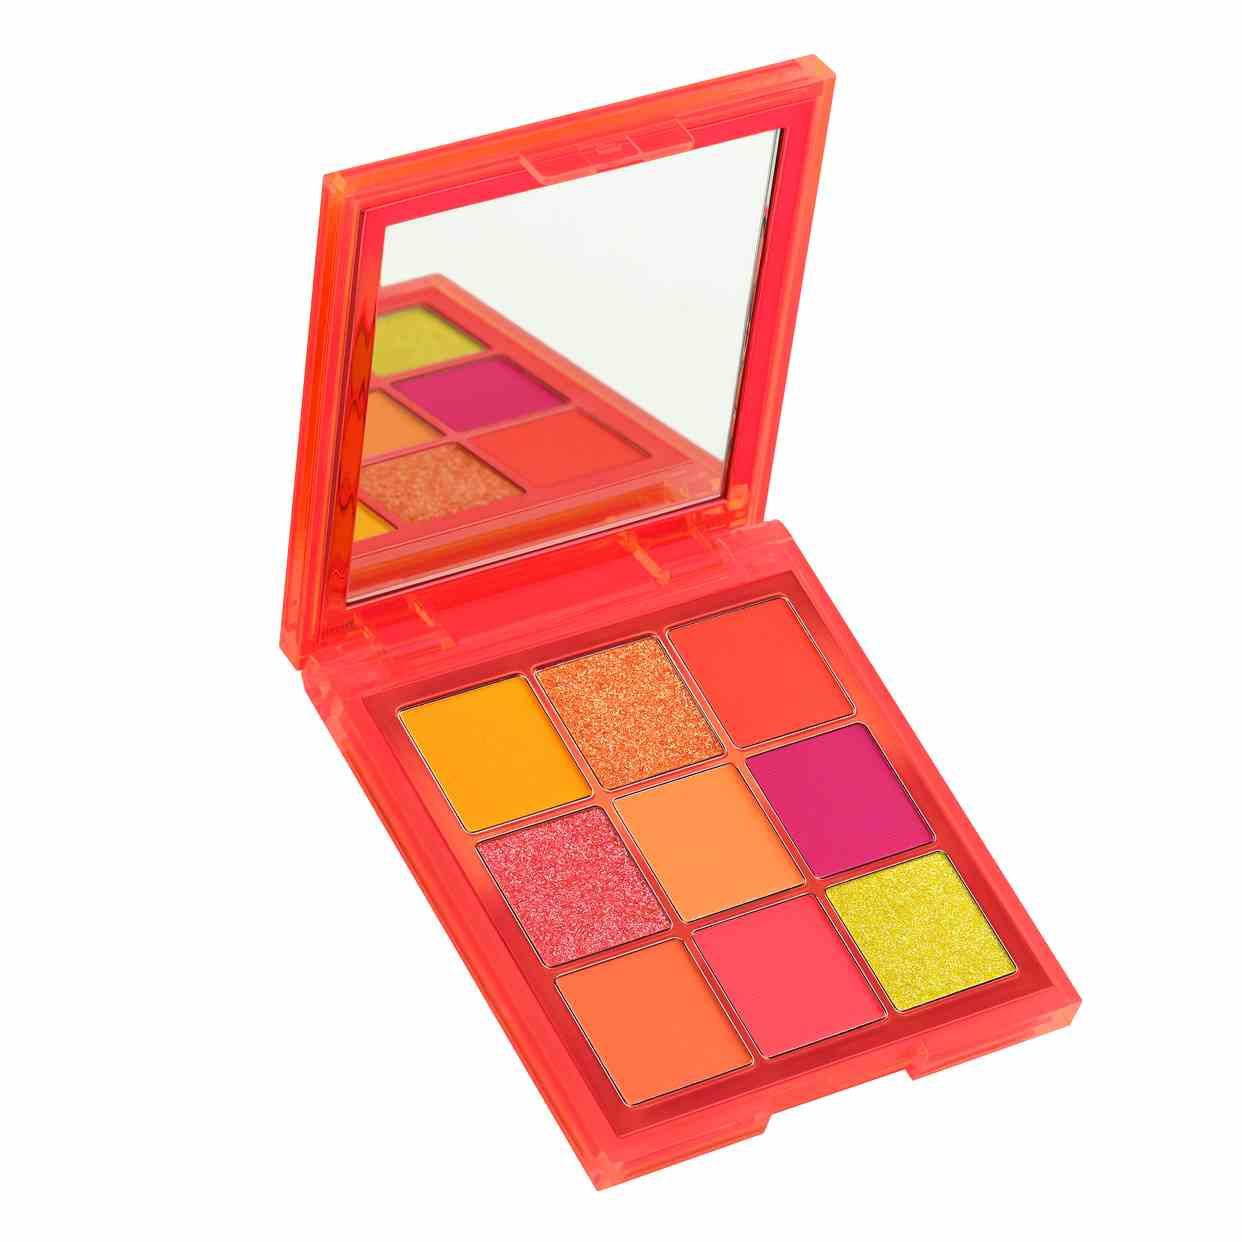 Paleta de Sombra Neon Orange | Huda Beauty